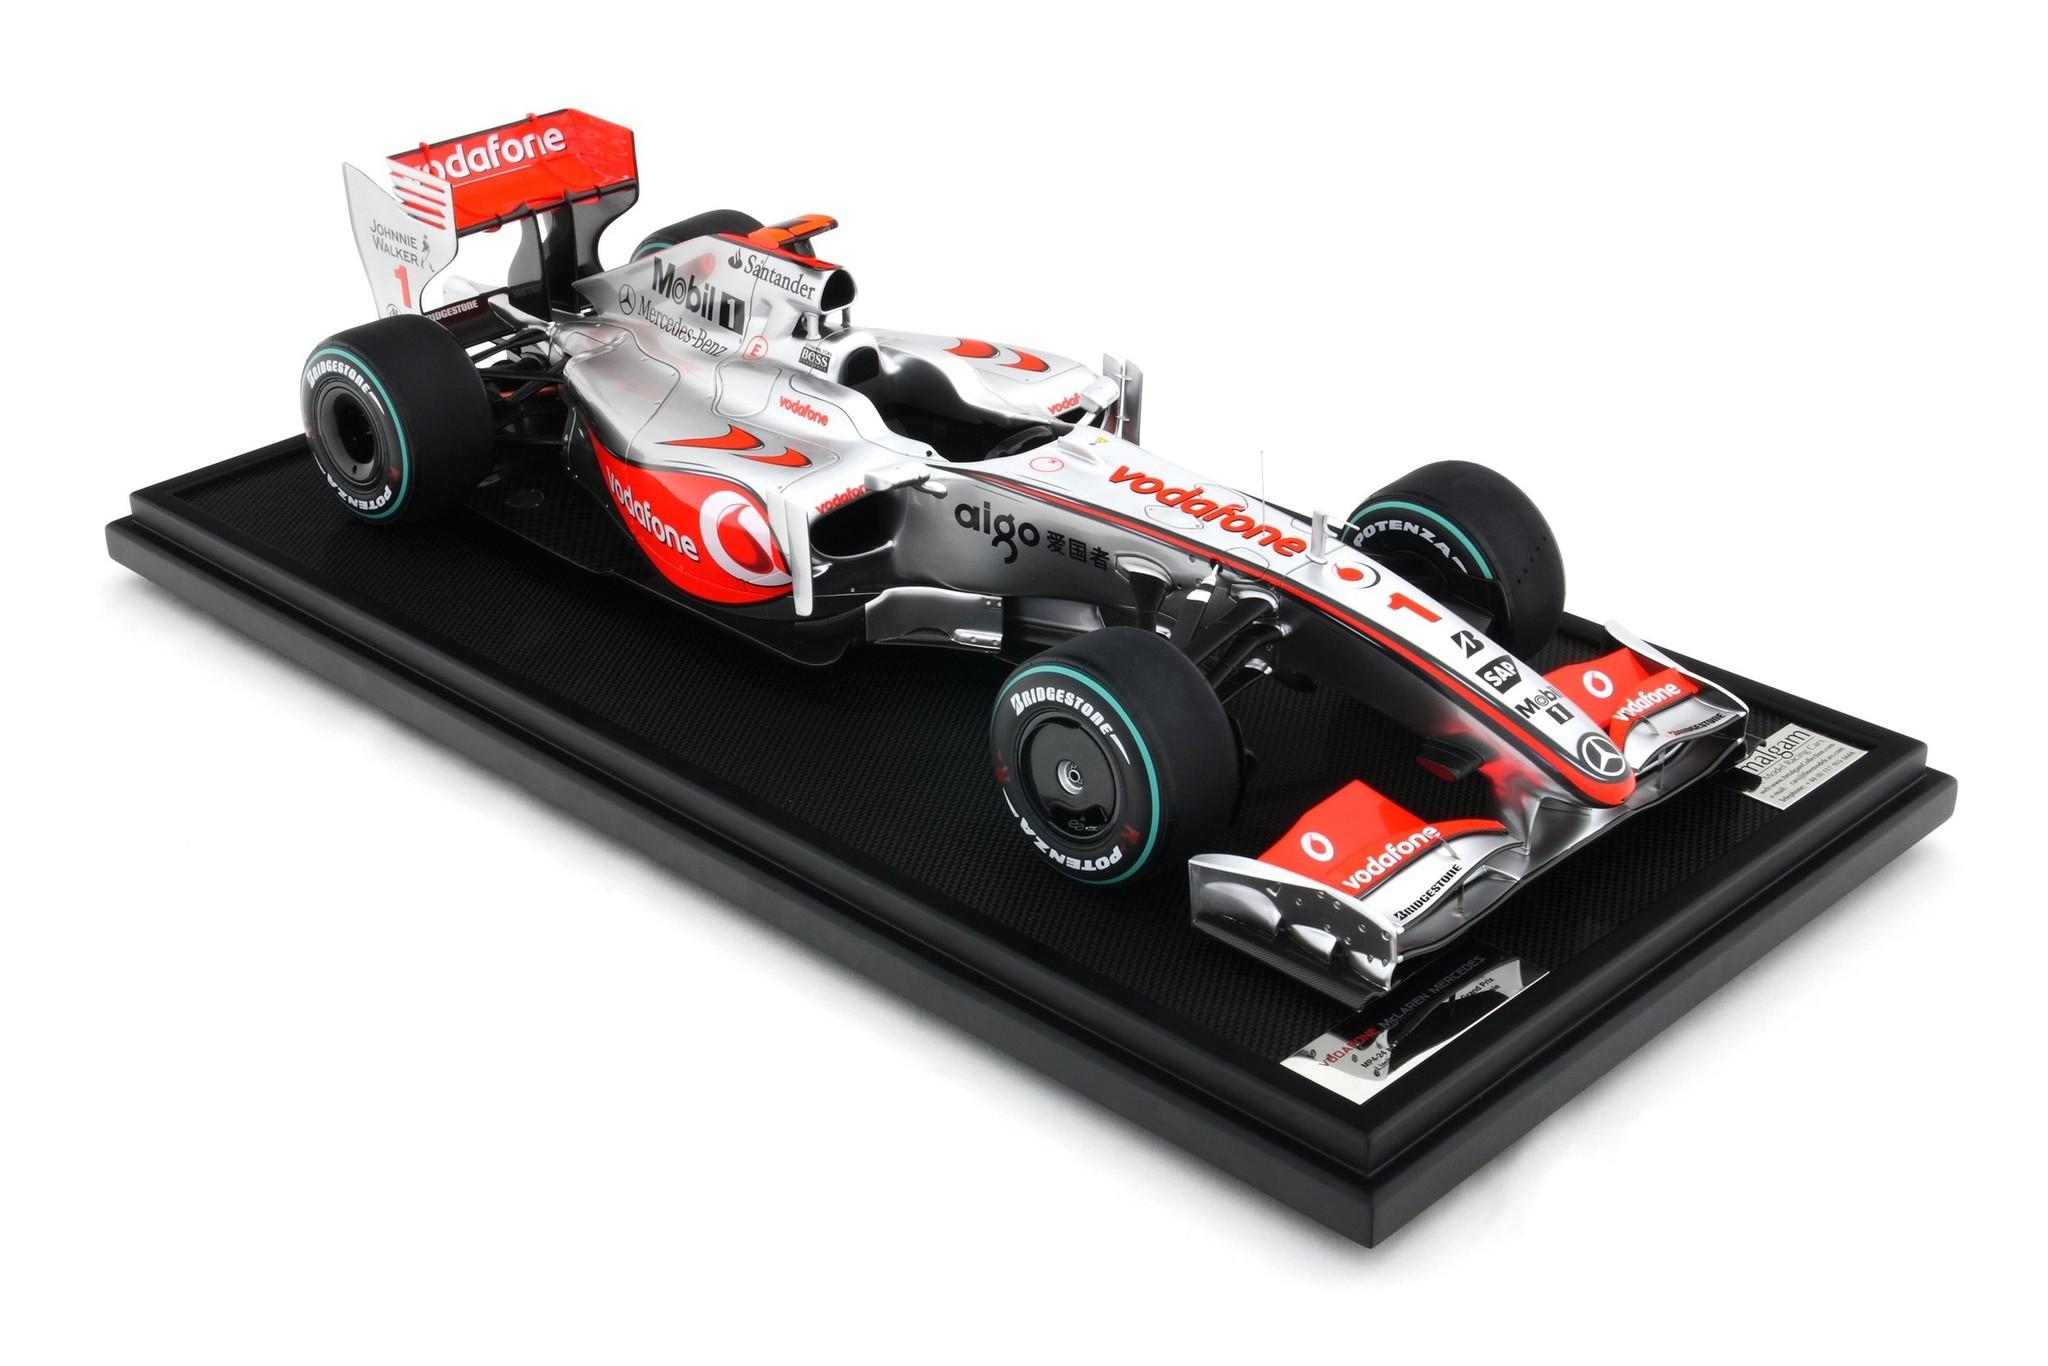 Amalgam McLaren MP4-24 GP van Hongarije 2009